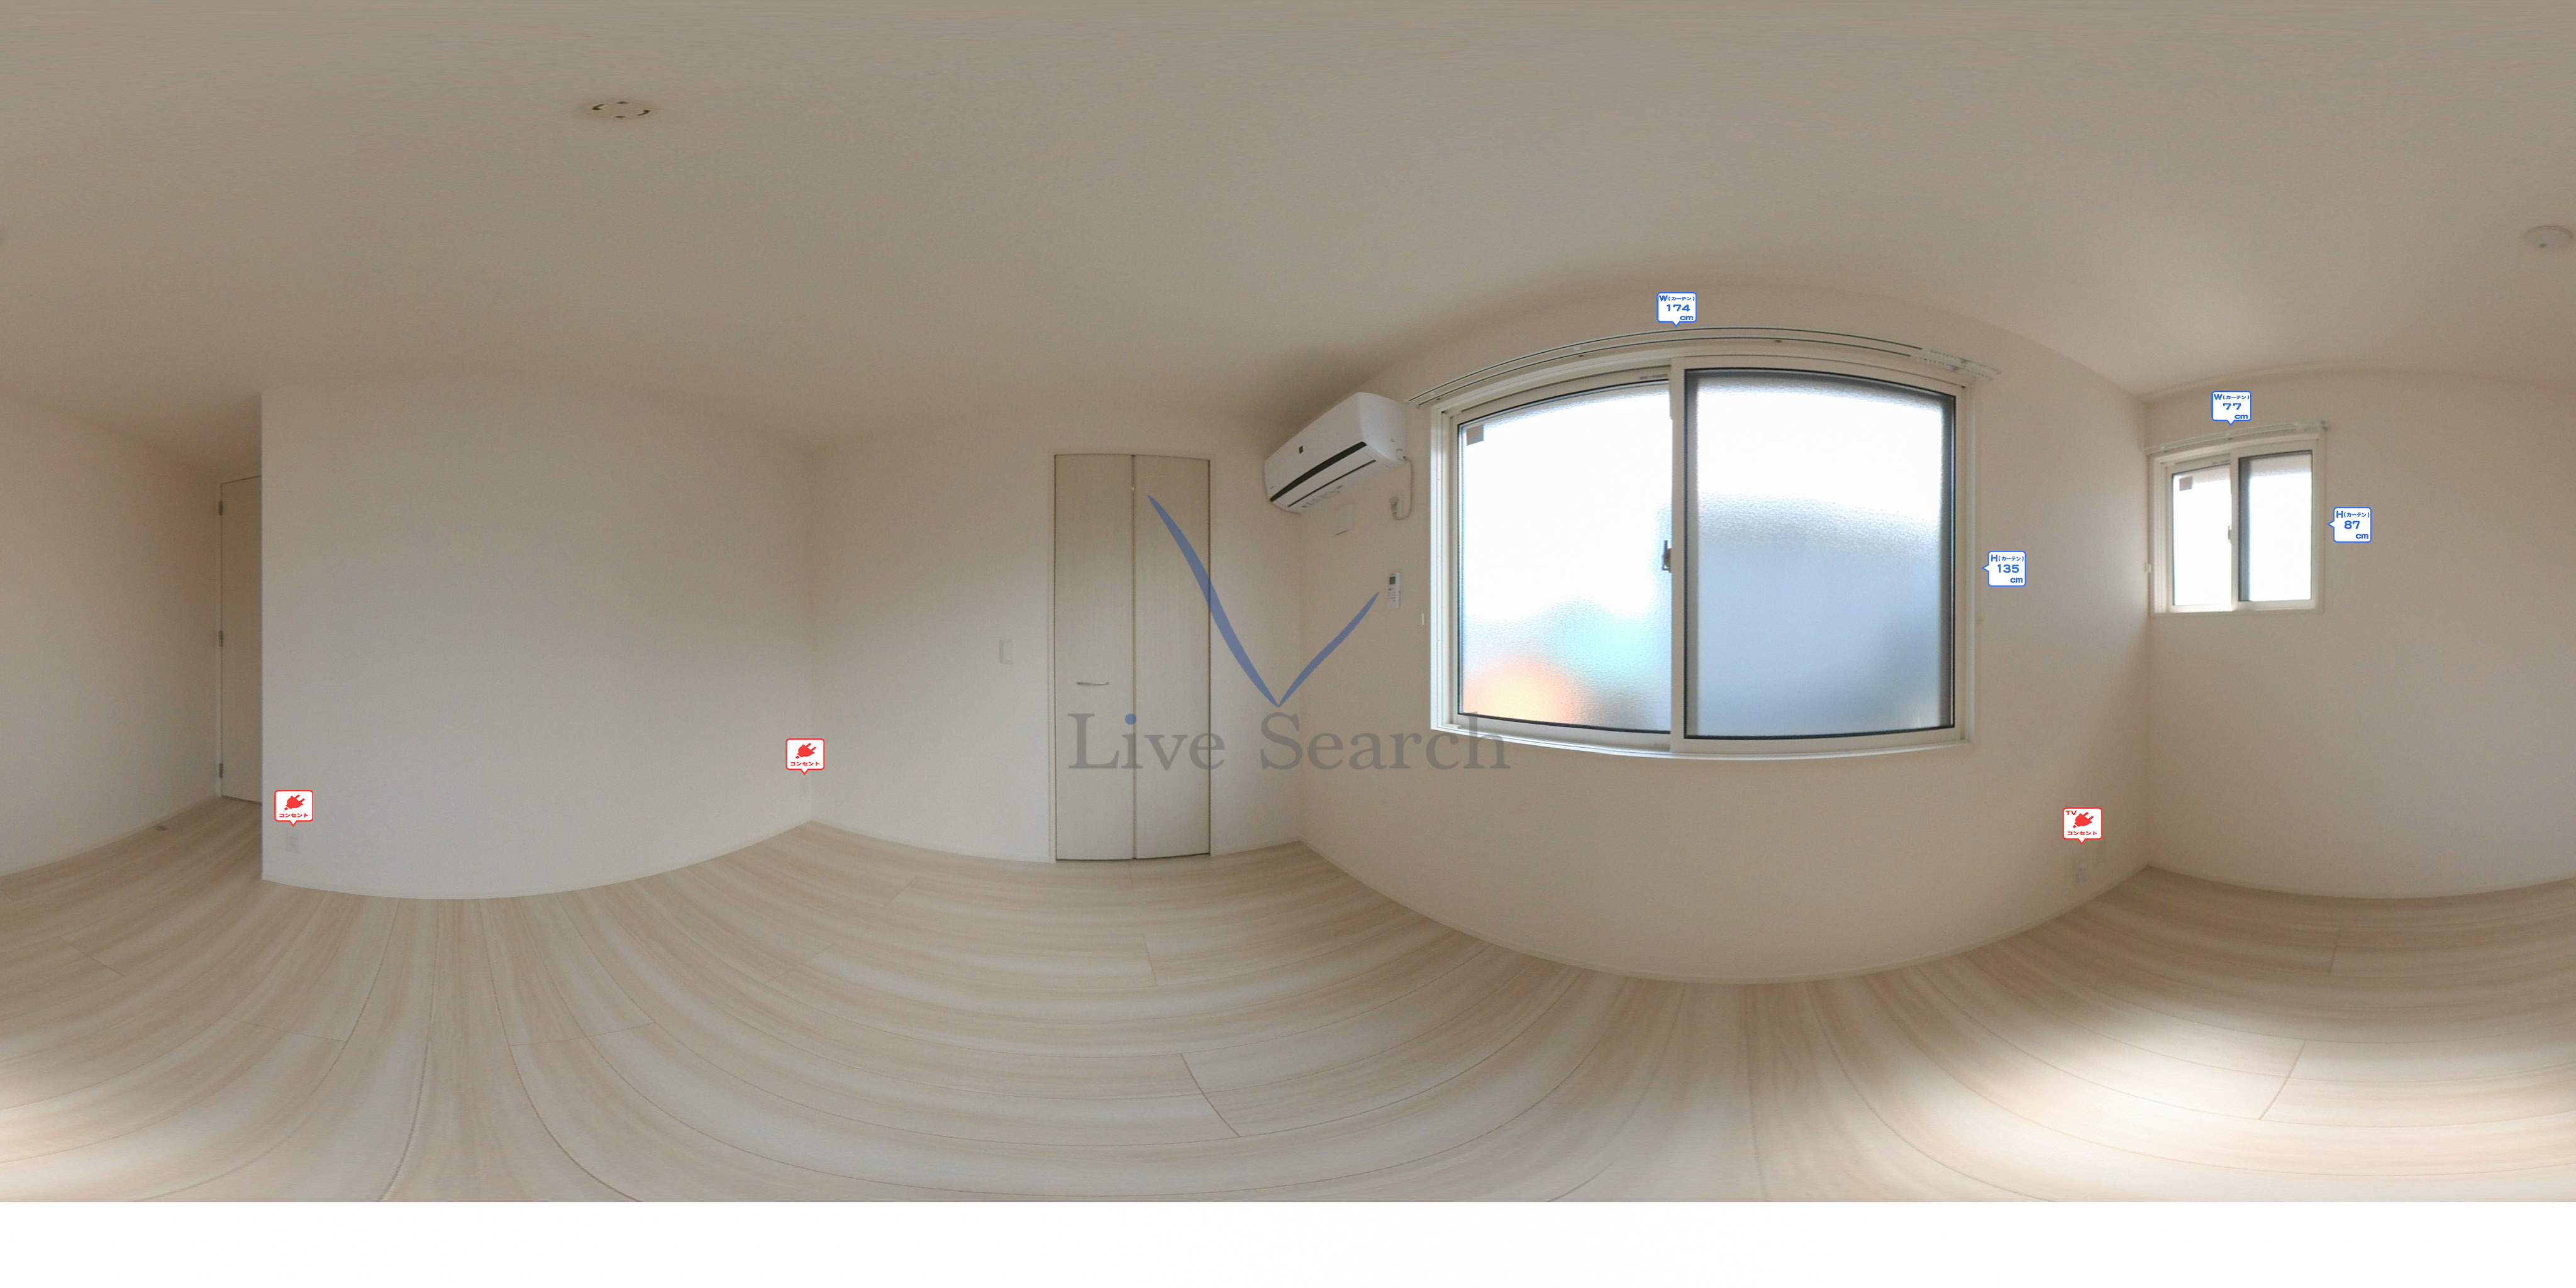 D-room南福岡 301 【博多区南福岡駅】 の外観写真